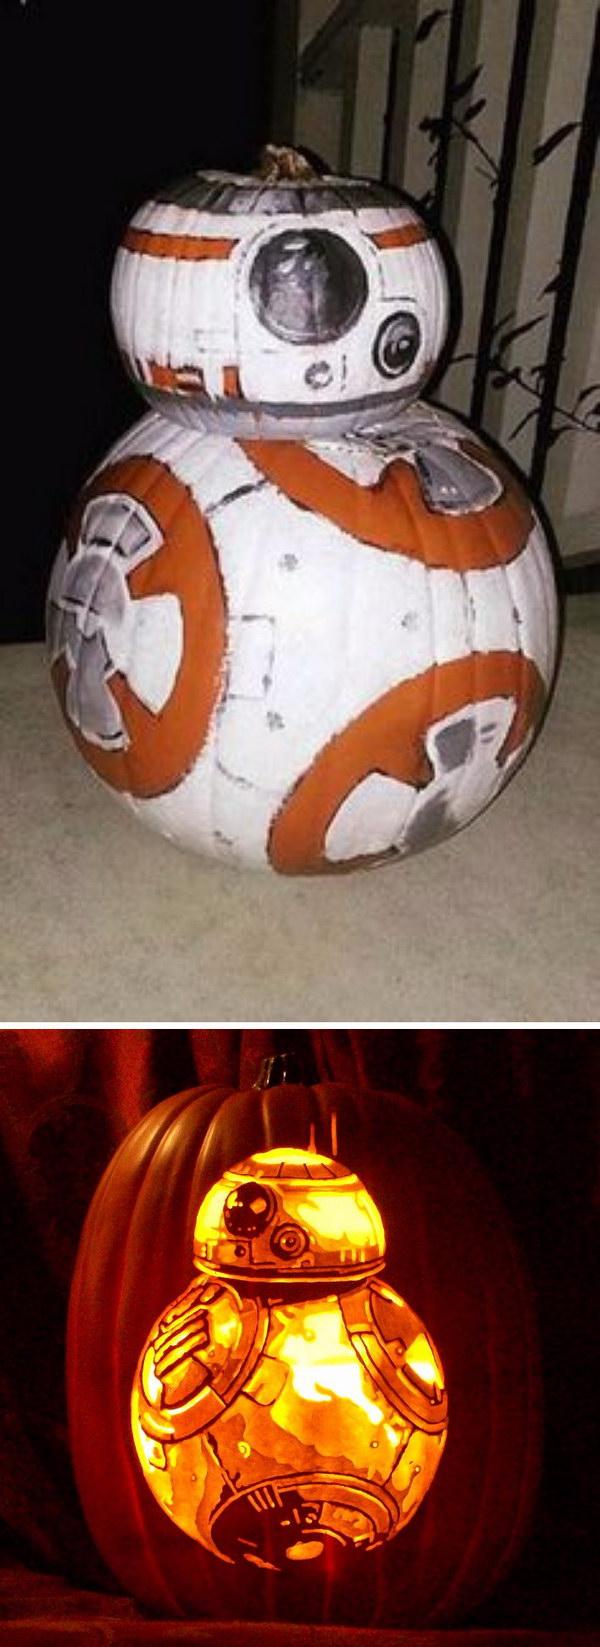 50+ Kid-Friendly No-Carve Pumpkin Decorating Ideas - Hative